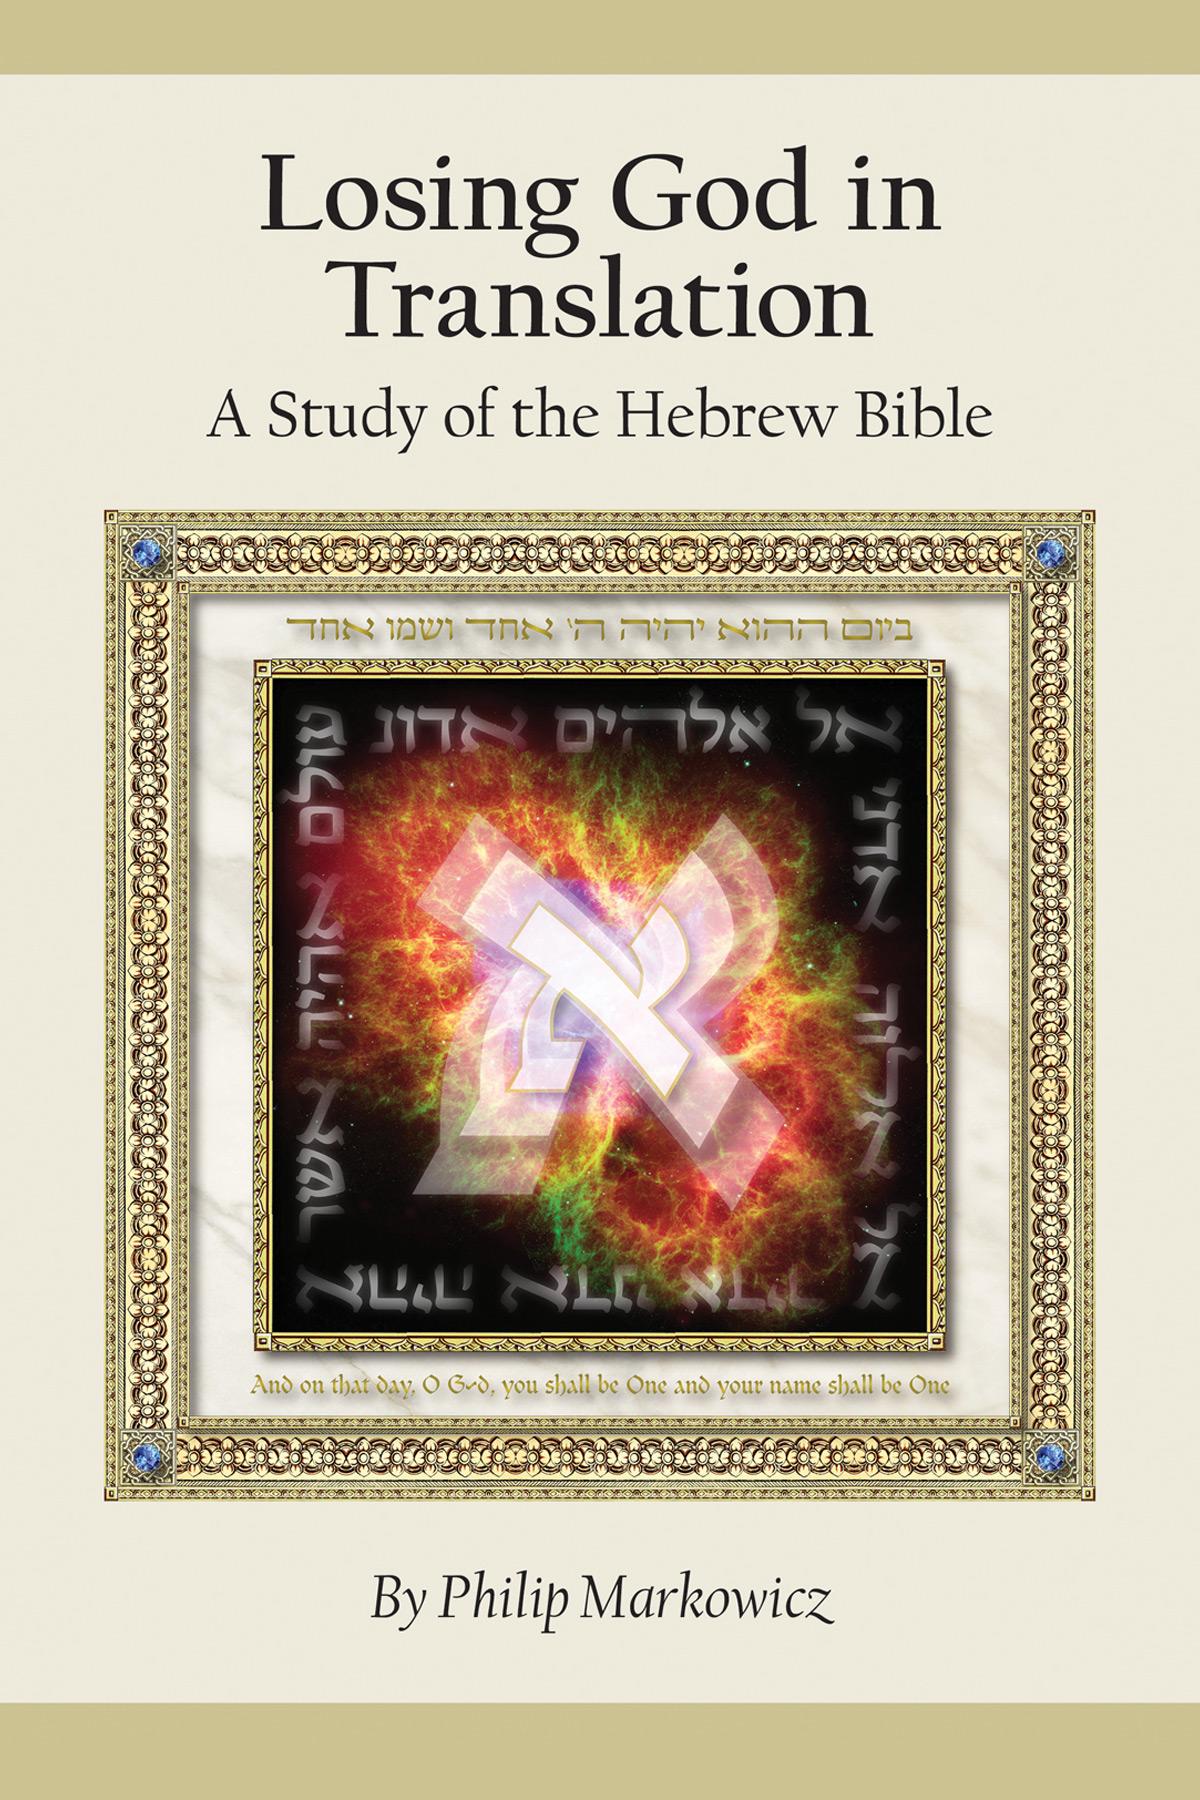 Losing God in Translation